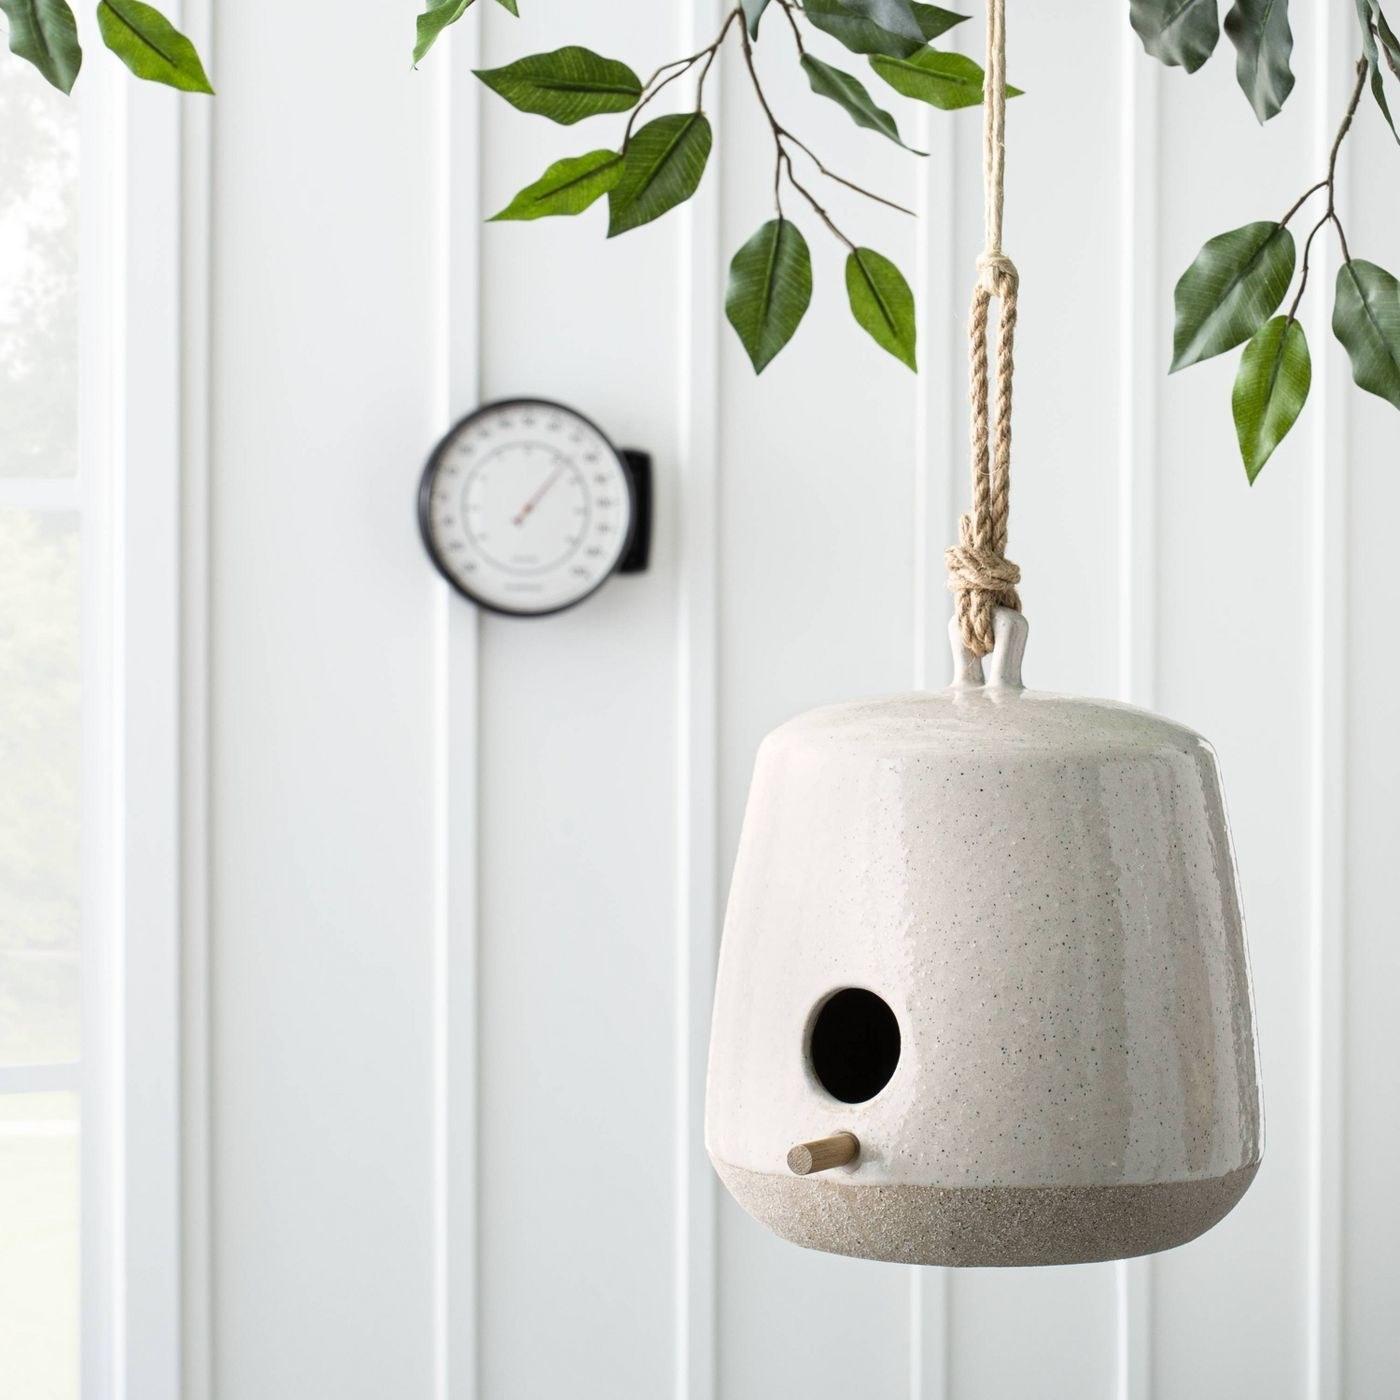 Cream colored bird house